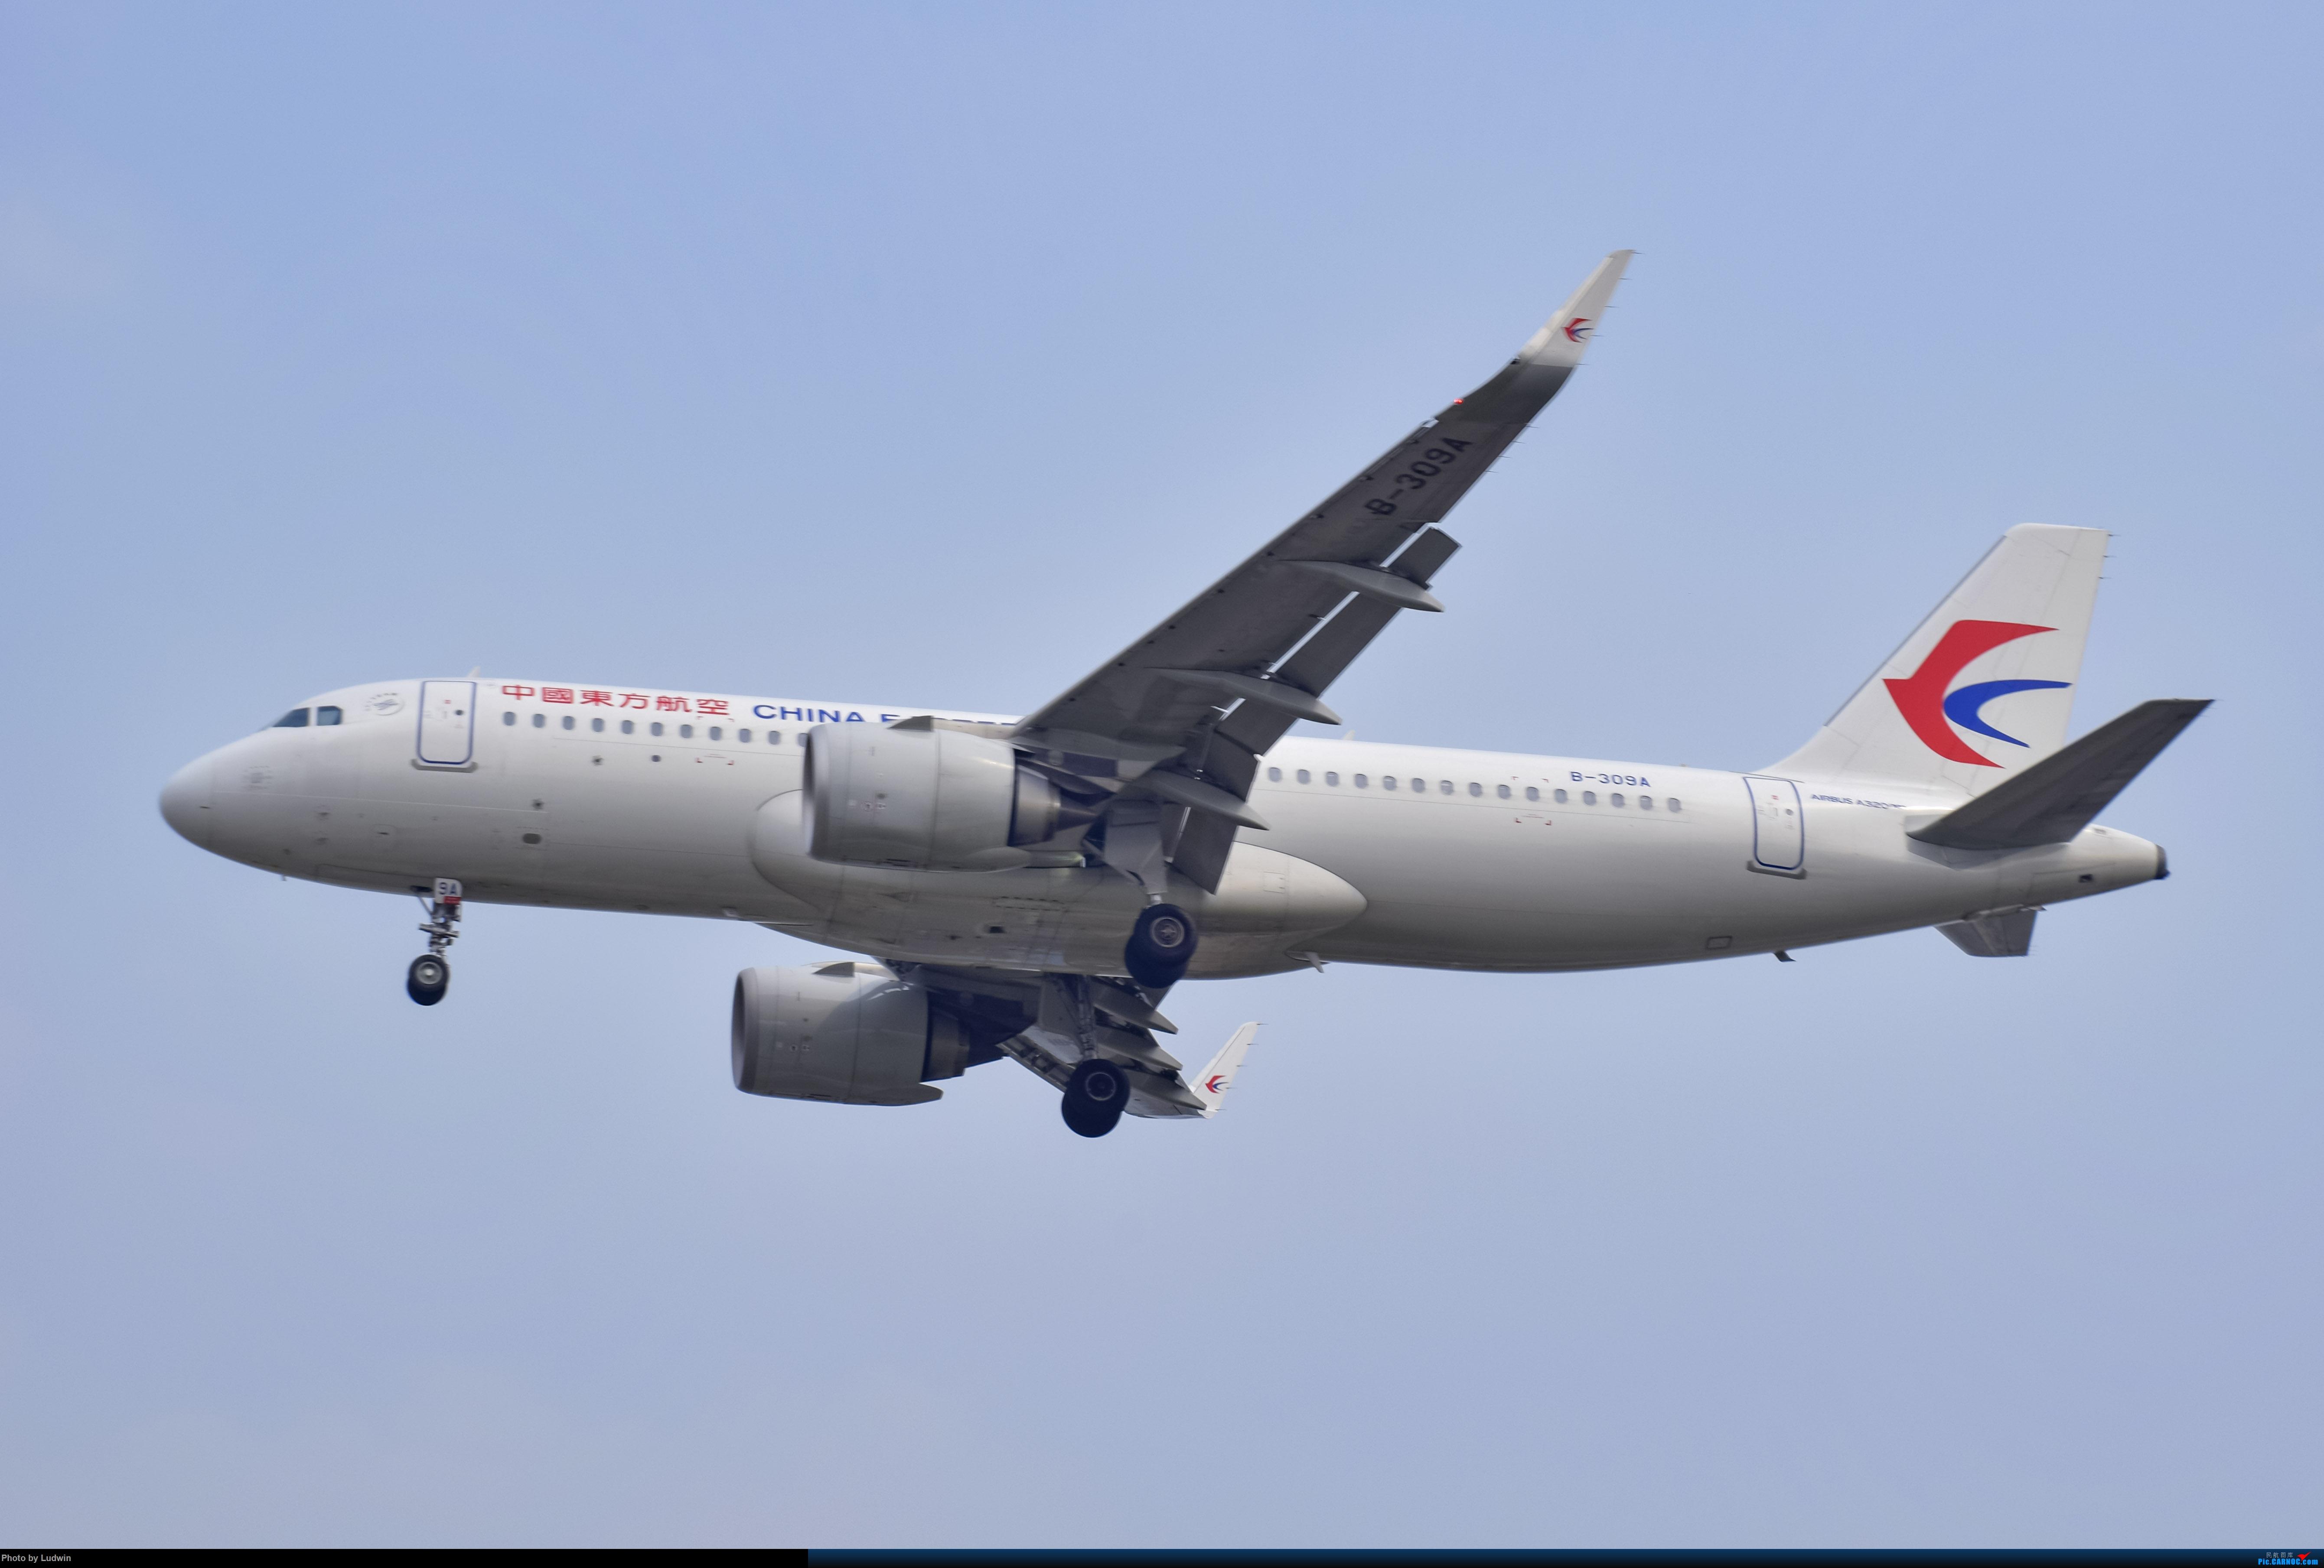 Re:[原创]没有地景系列 AIRBUS A320NEO B-309A 中国重庆江北国际机场